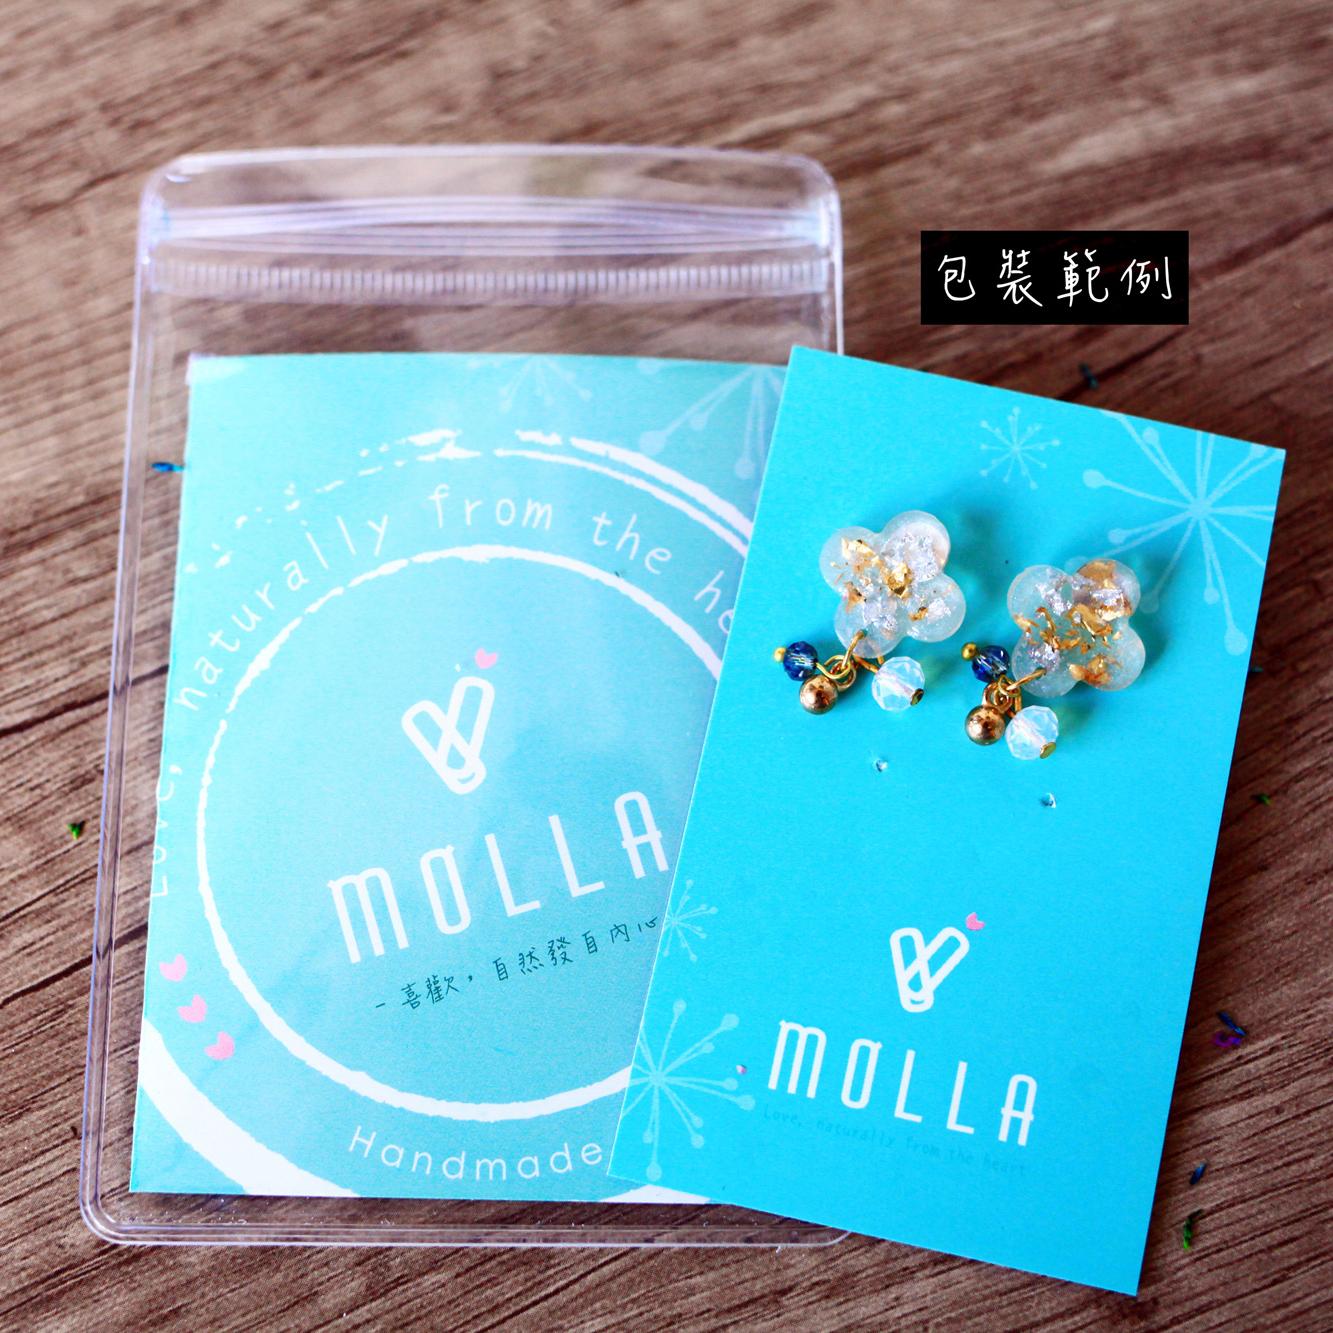 Molla X idecor 雙菱形隨手畫畫仙人掌耳環(純銀針耳環-手工訂製)